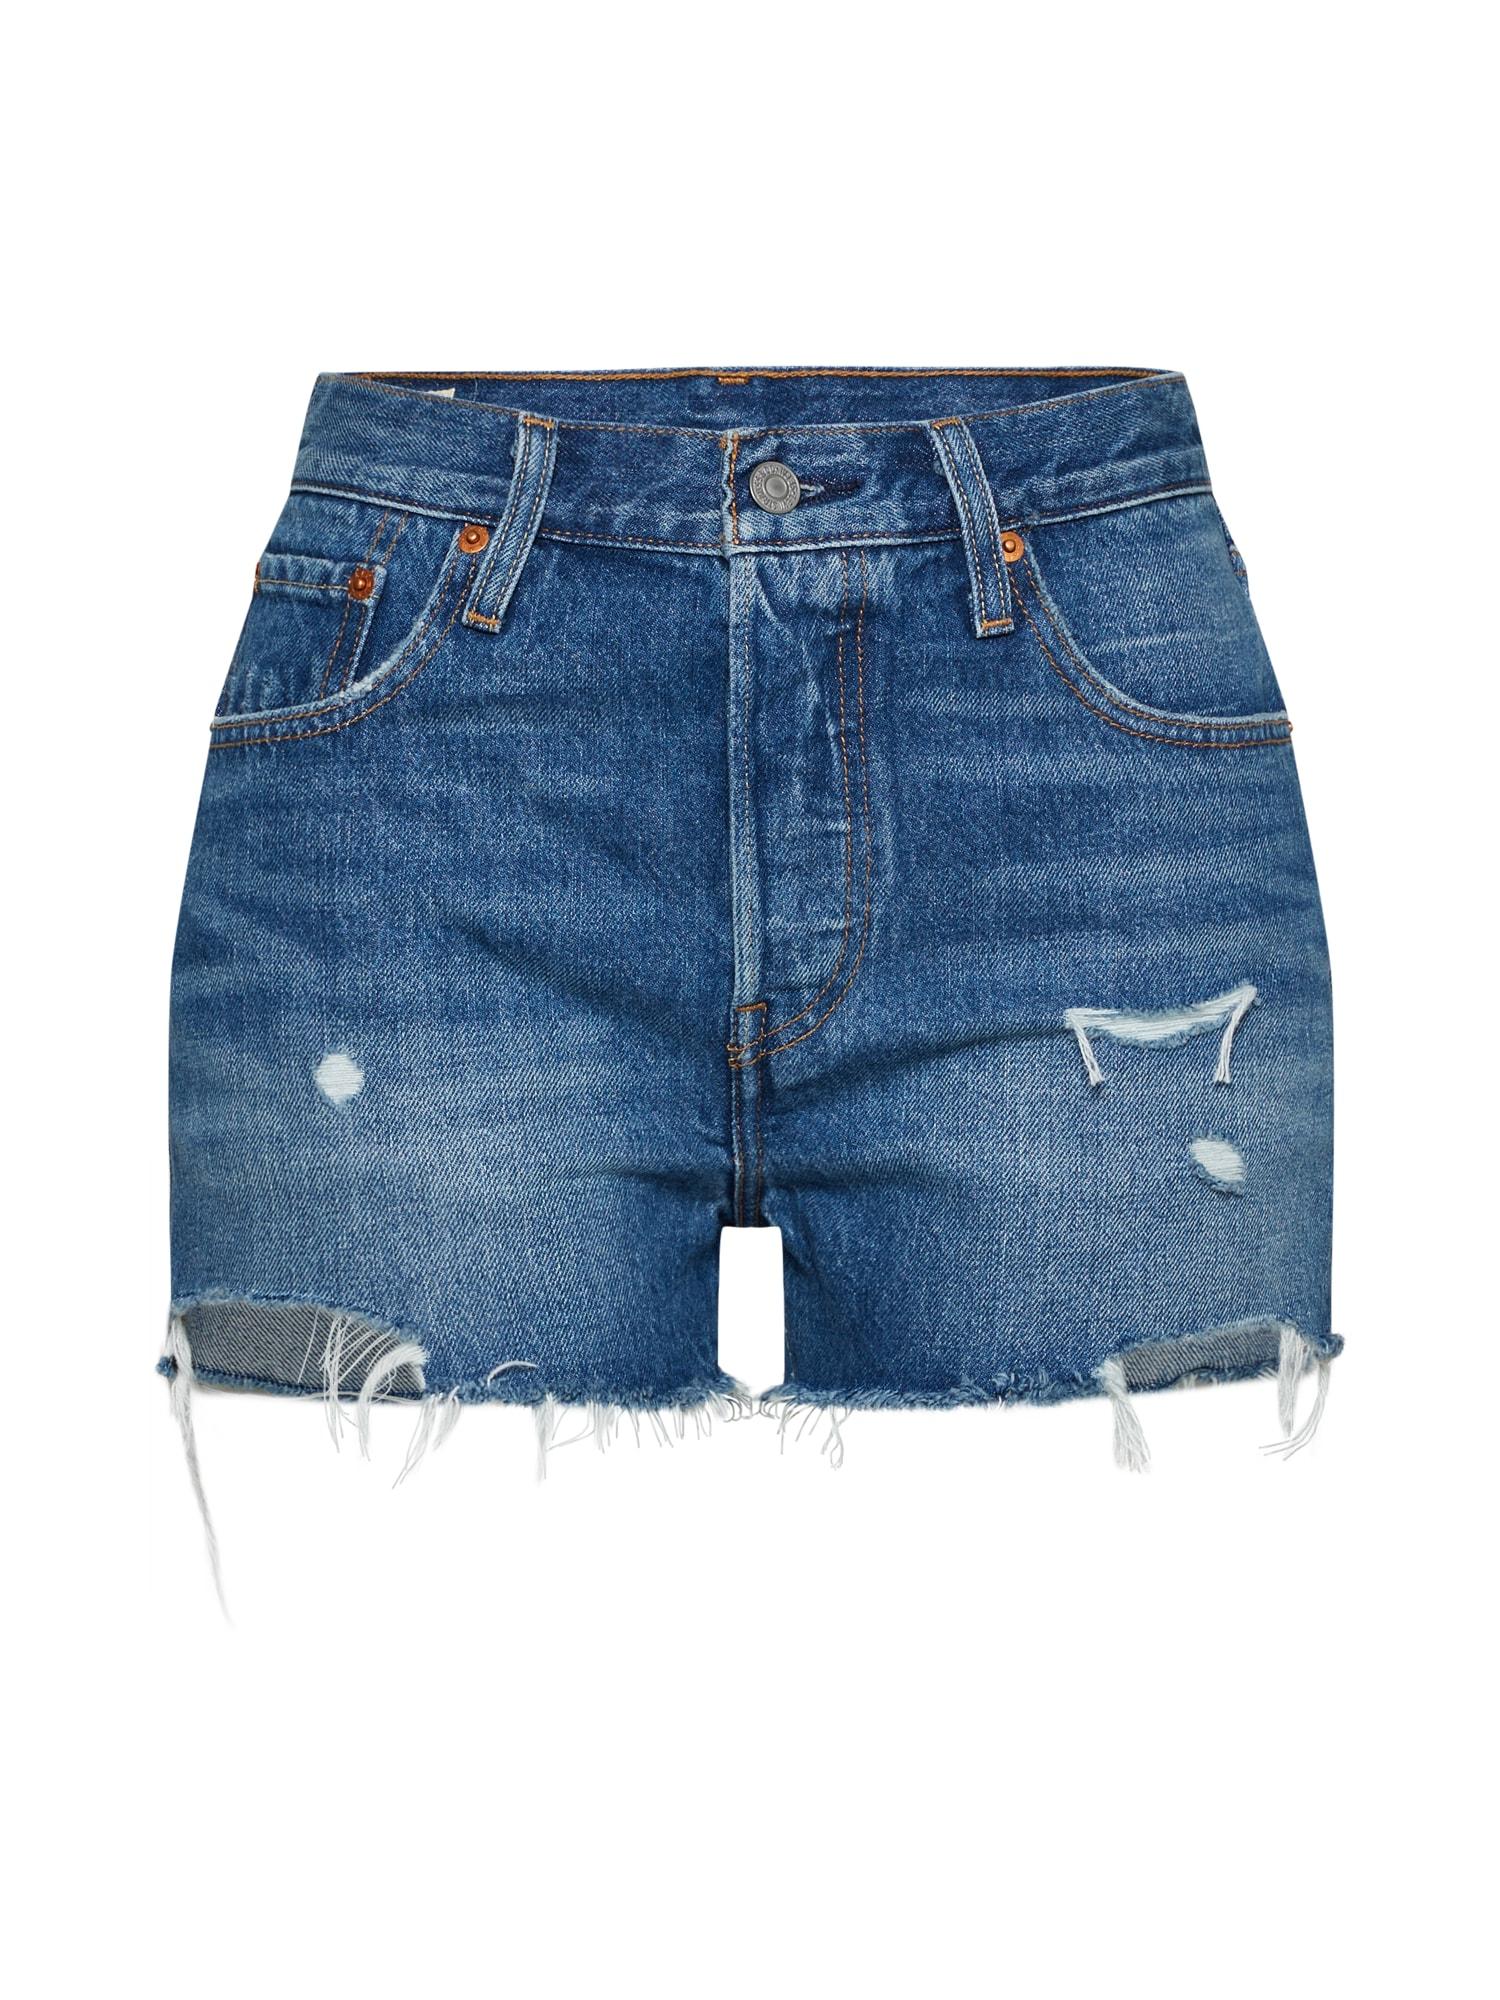 LEVI'S Dames Jeans 501® HIGH RISE blauw denim